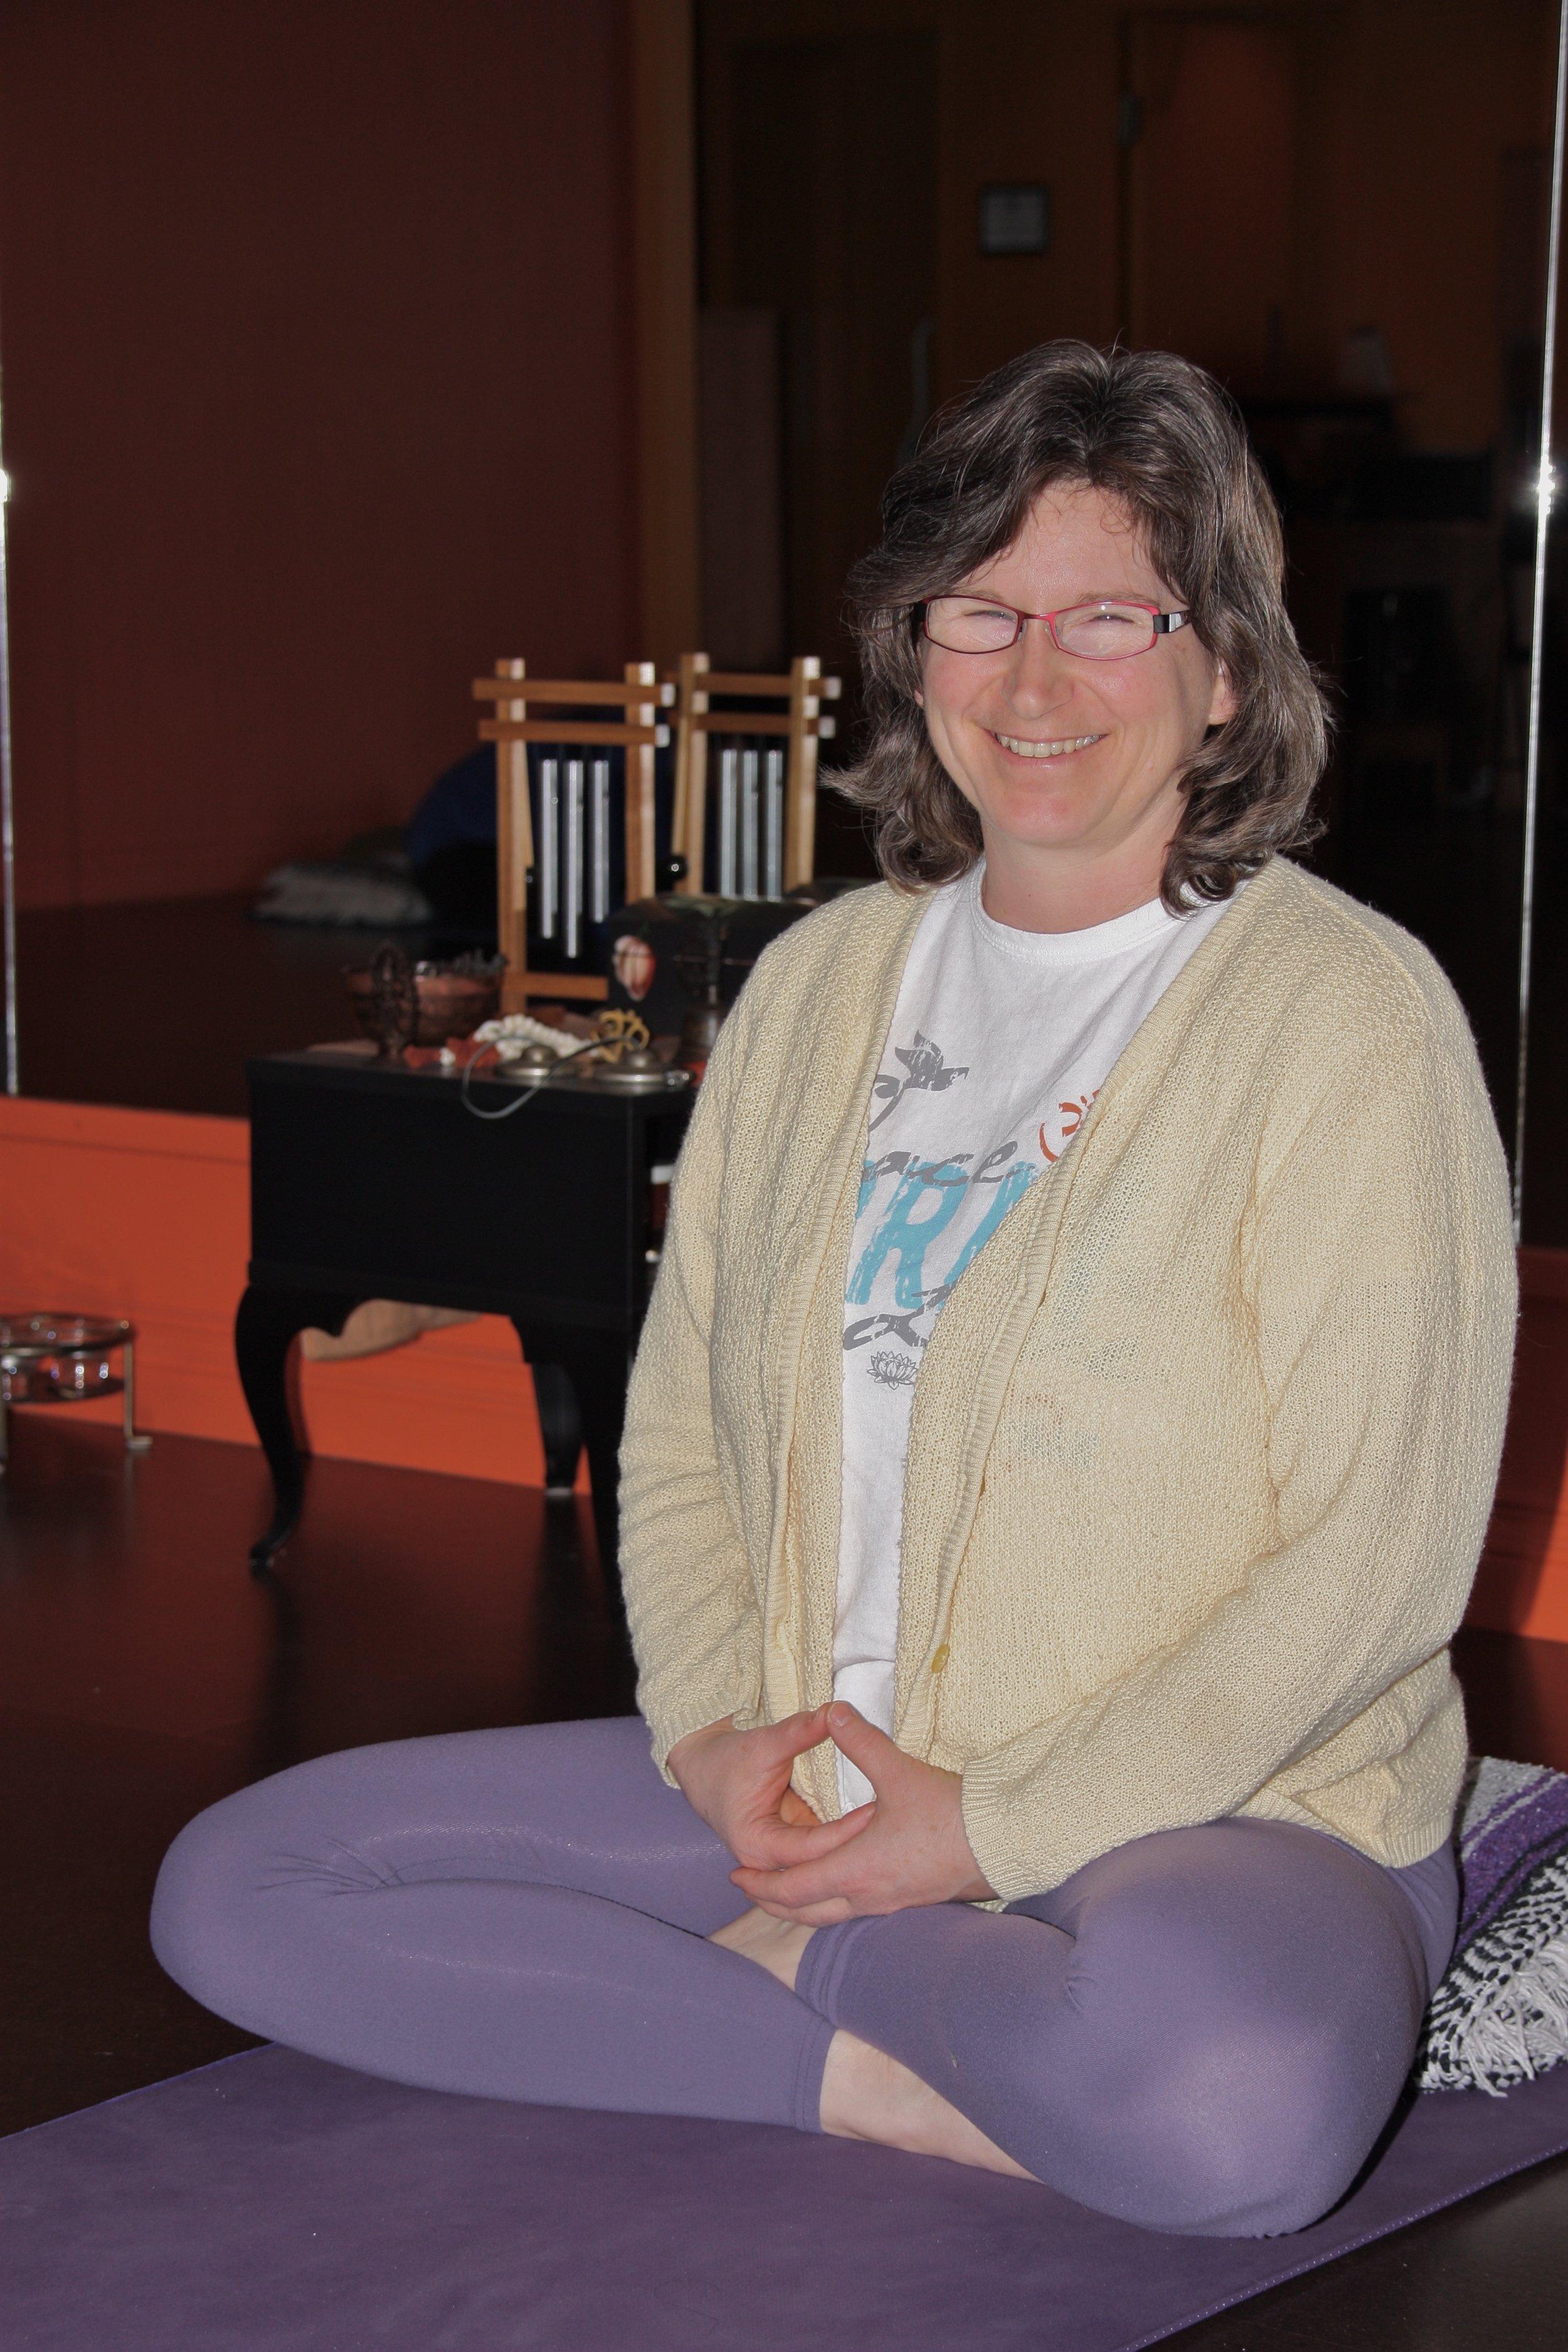 Yoga, Yoga Therapy, & Ayurveda - Paula Carnegie Fehr, Senior Hatha Yoga Instructor YAA 800hrs+, YACEP, YA E-RYT200, C-IAYT Yoga Therapist